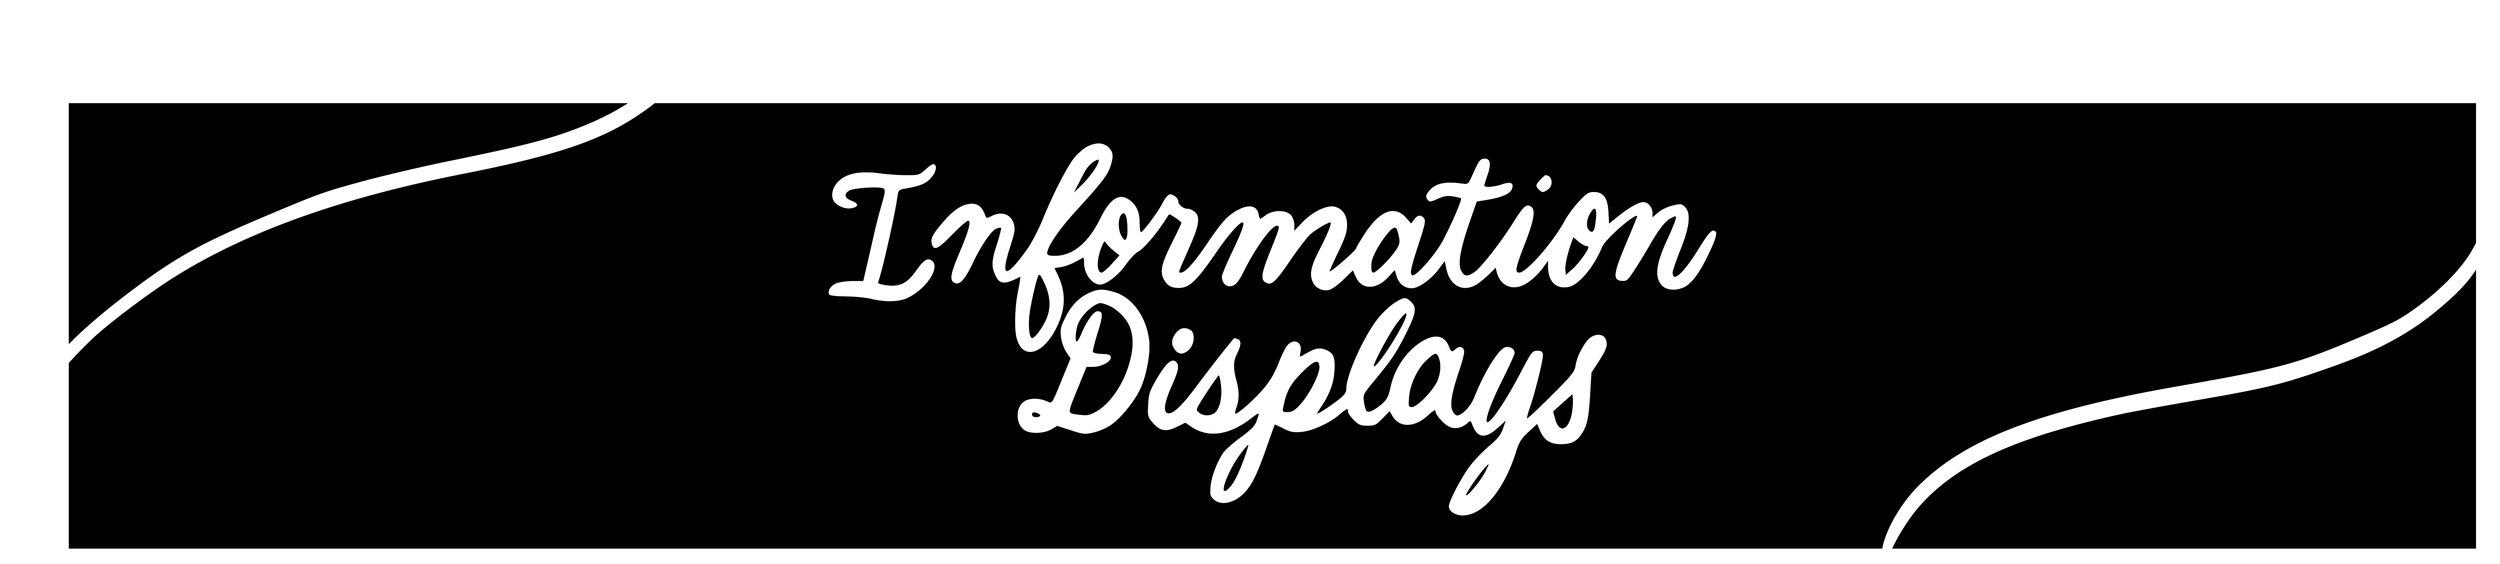 informationdisplay_title_slice_black.jpg